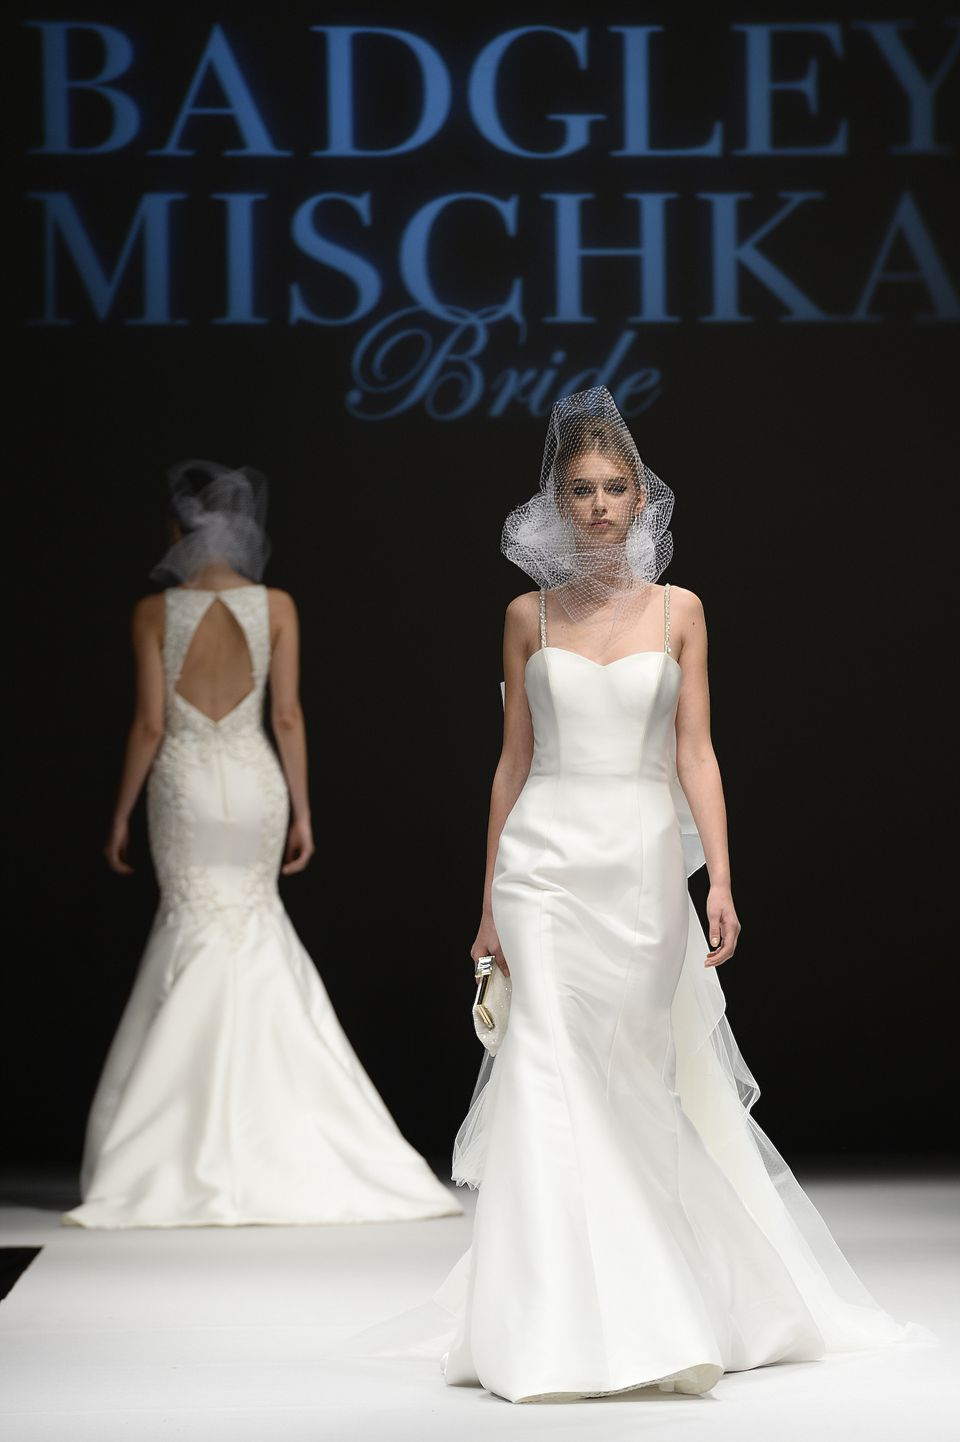 Badgley Mischka bridal gowns